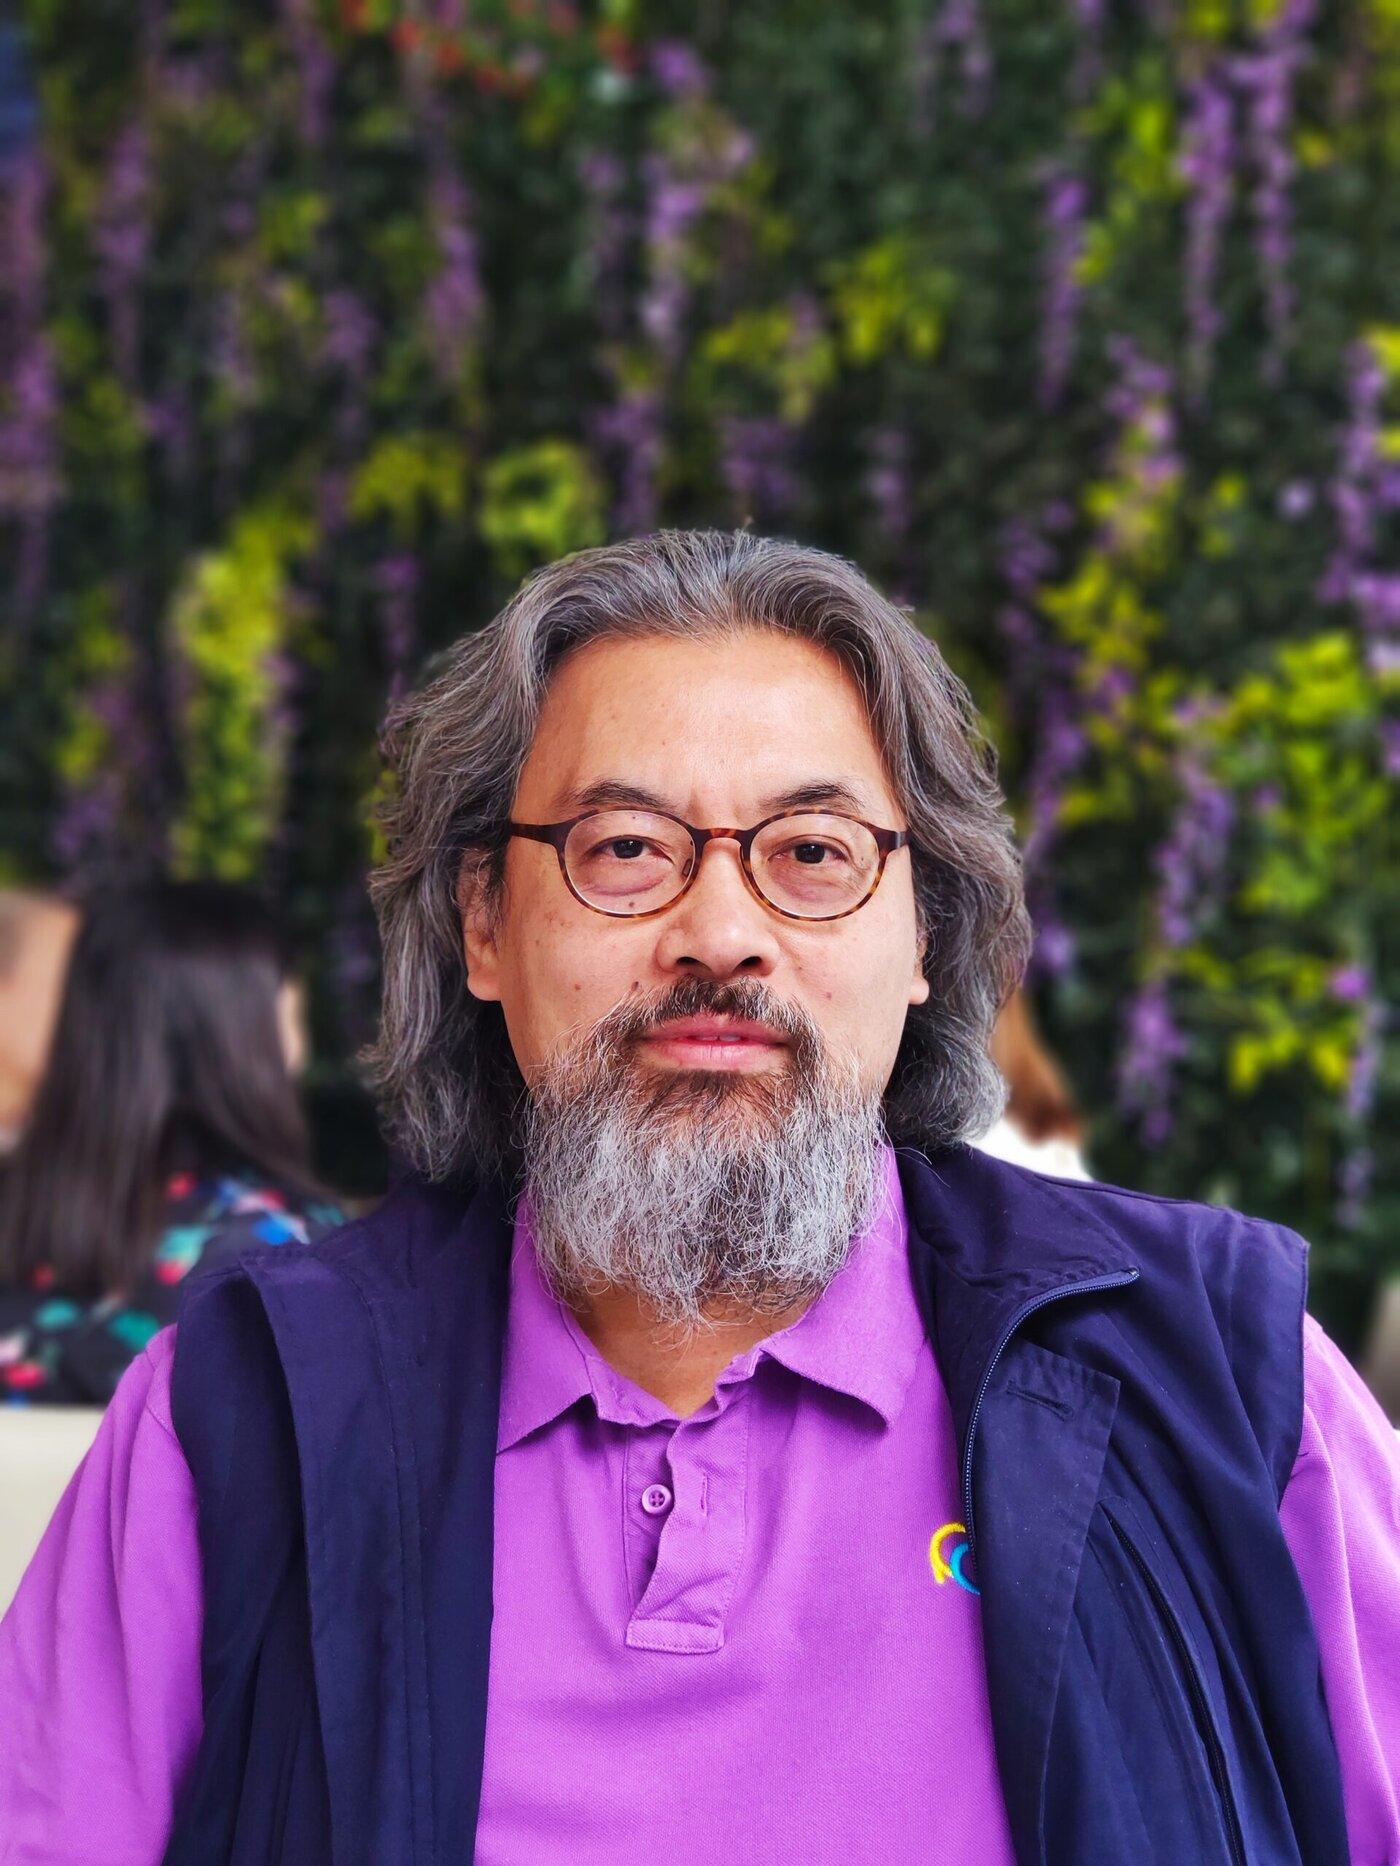 Anderesen Cheng, CEO of Post Quantum